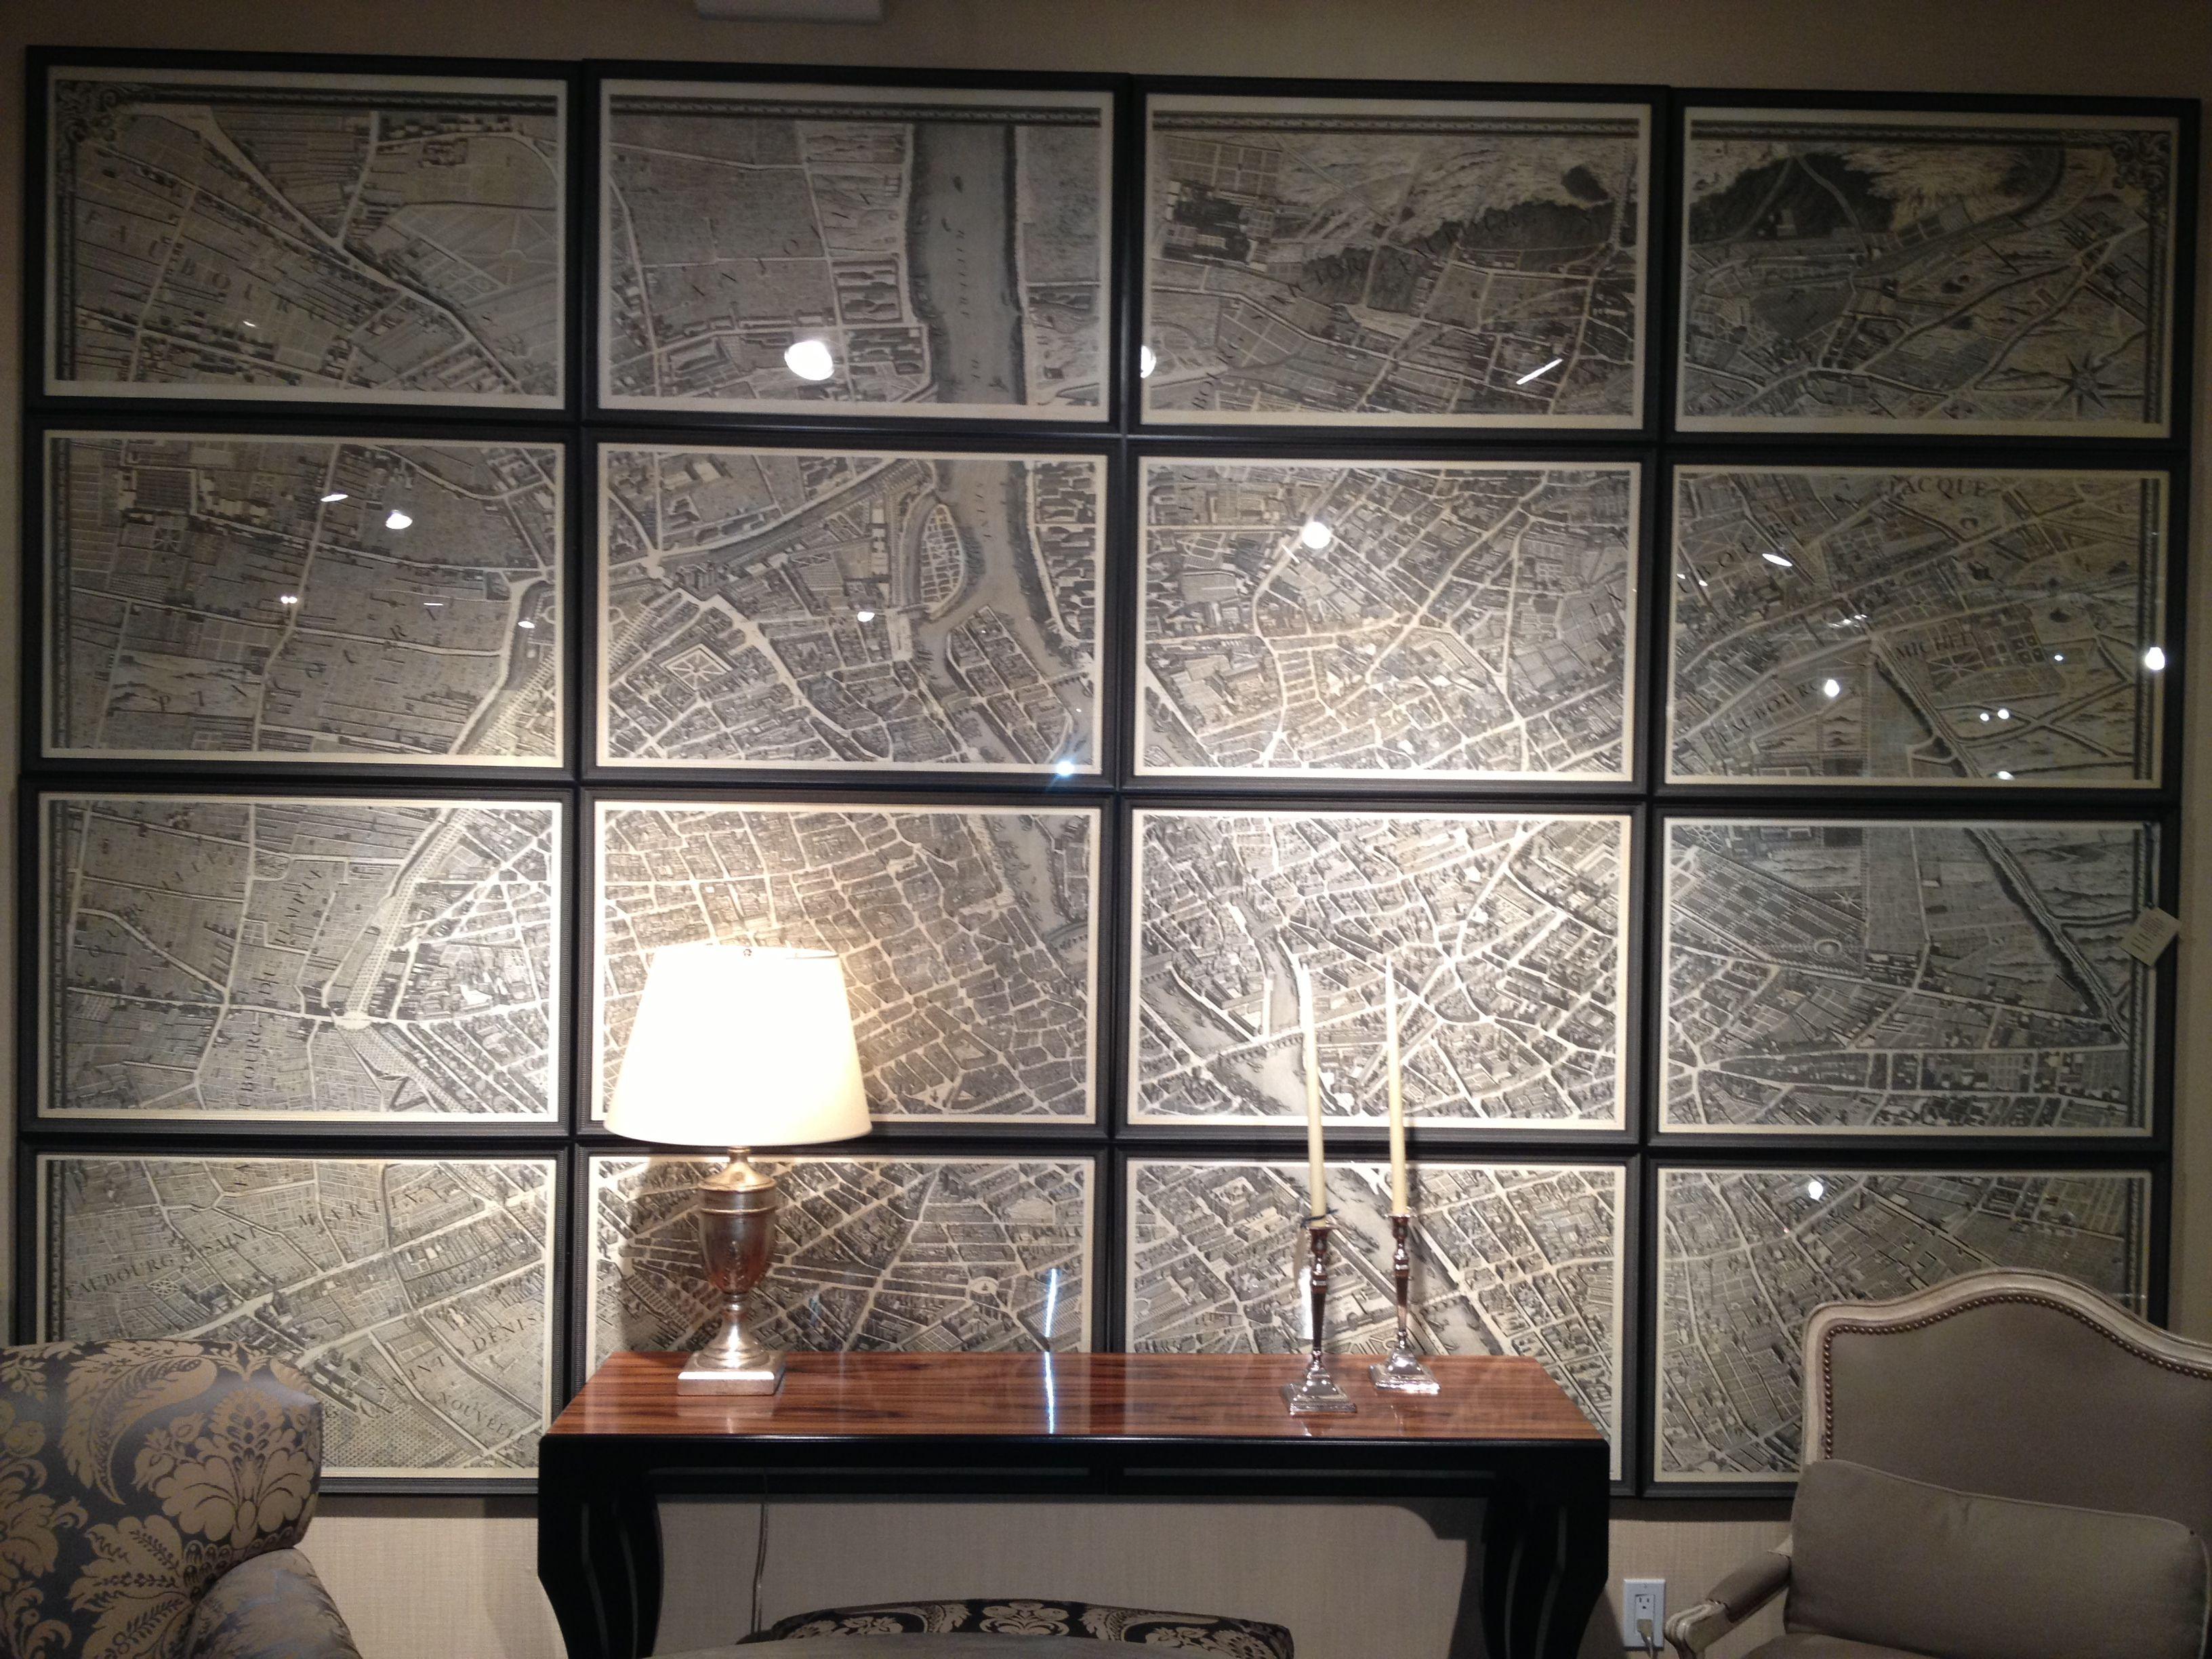 Turgot Map of Paris at NY Design